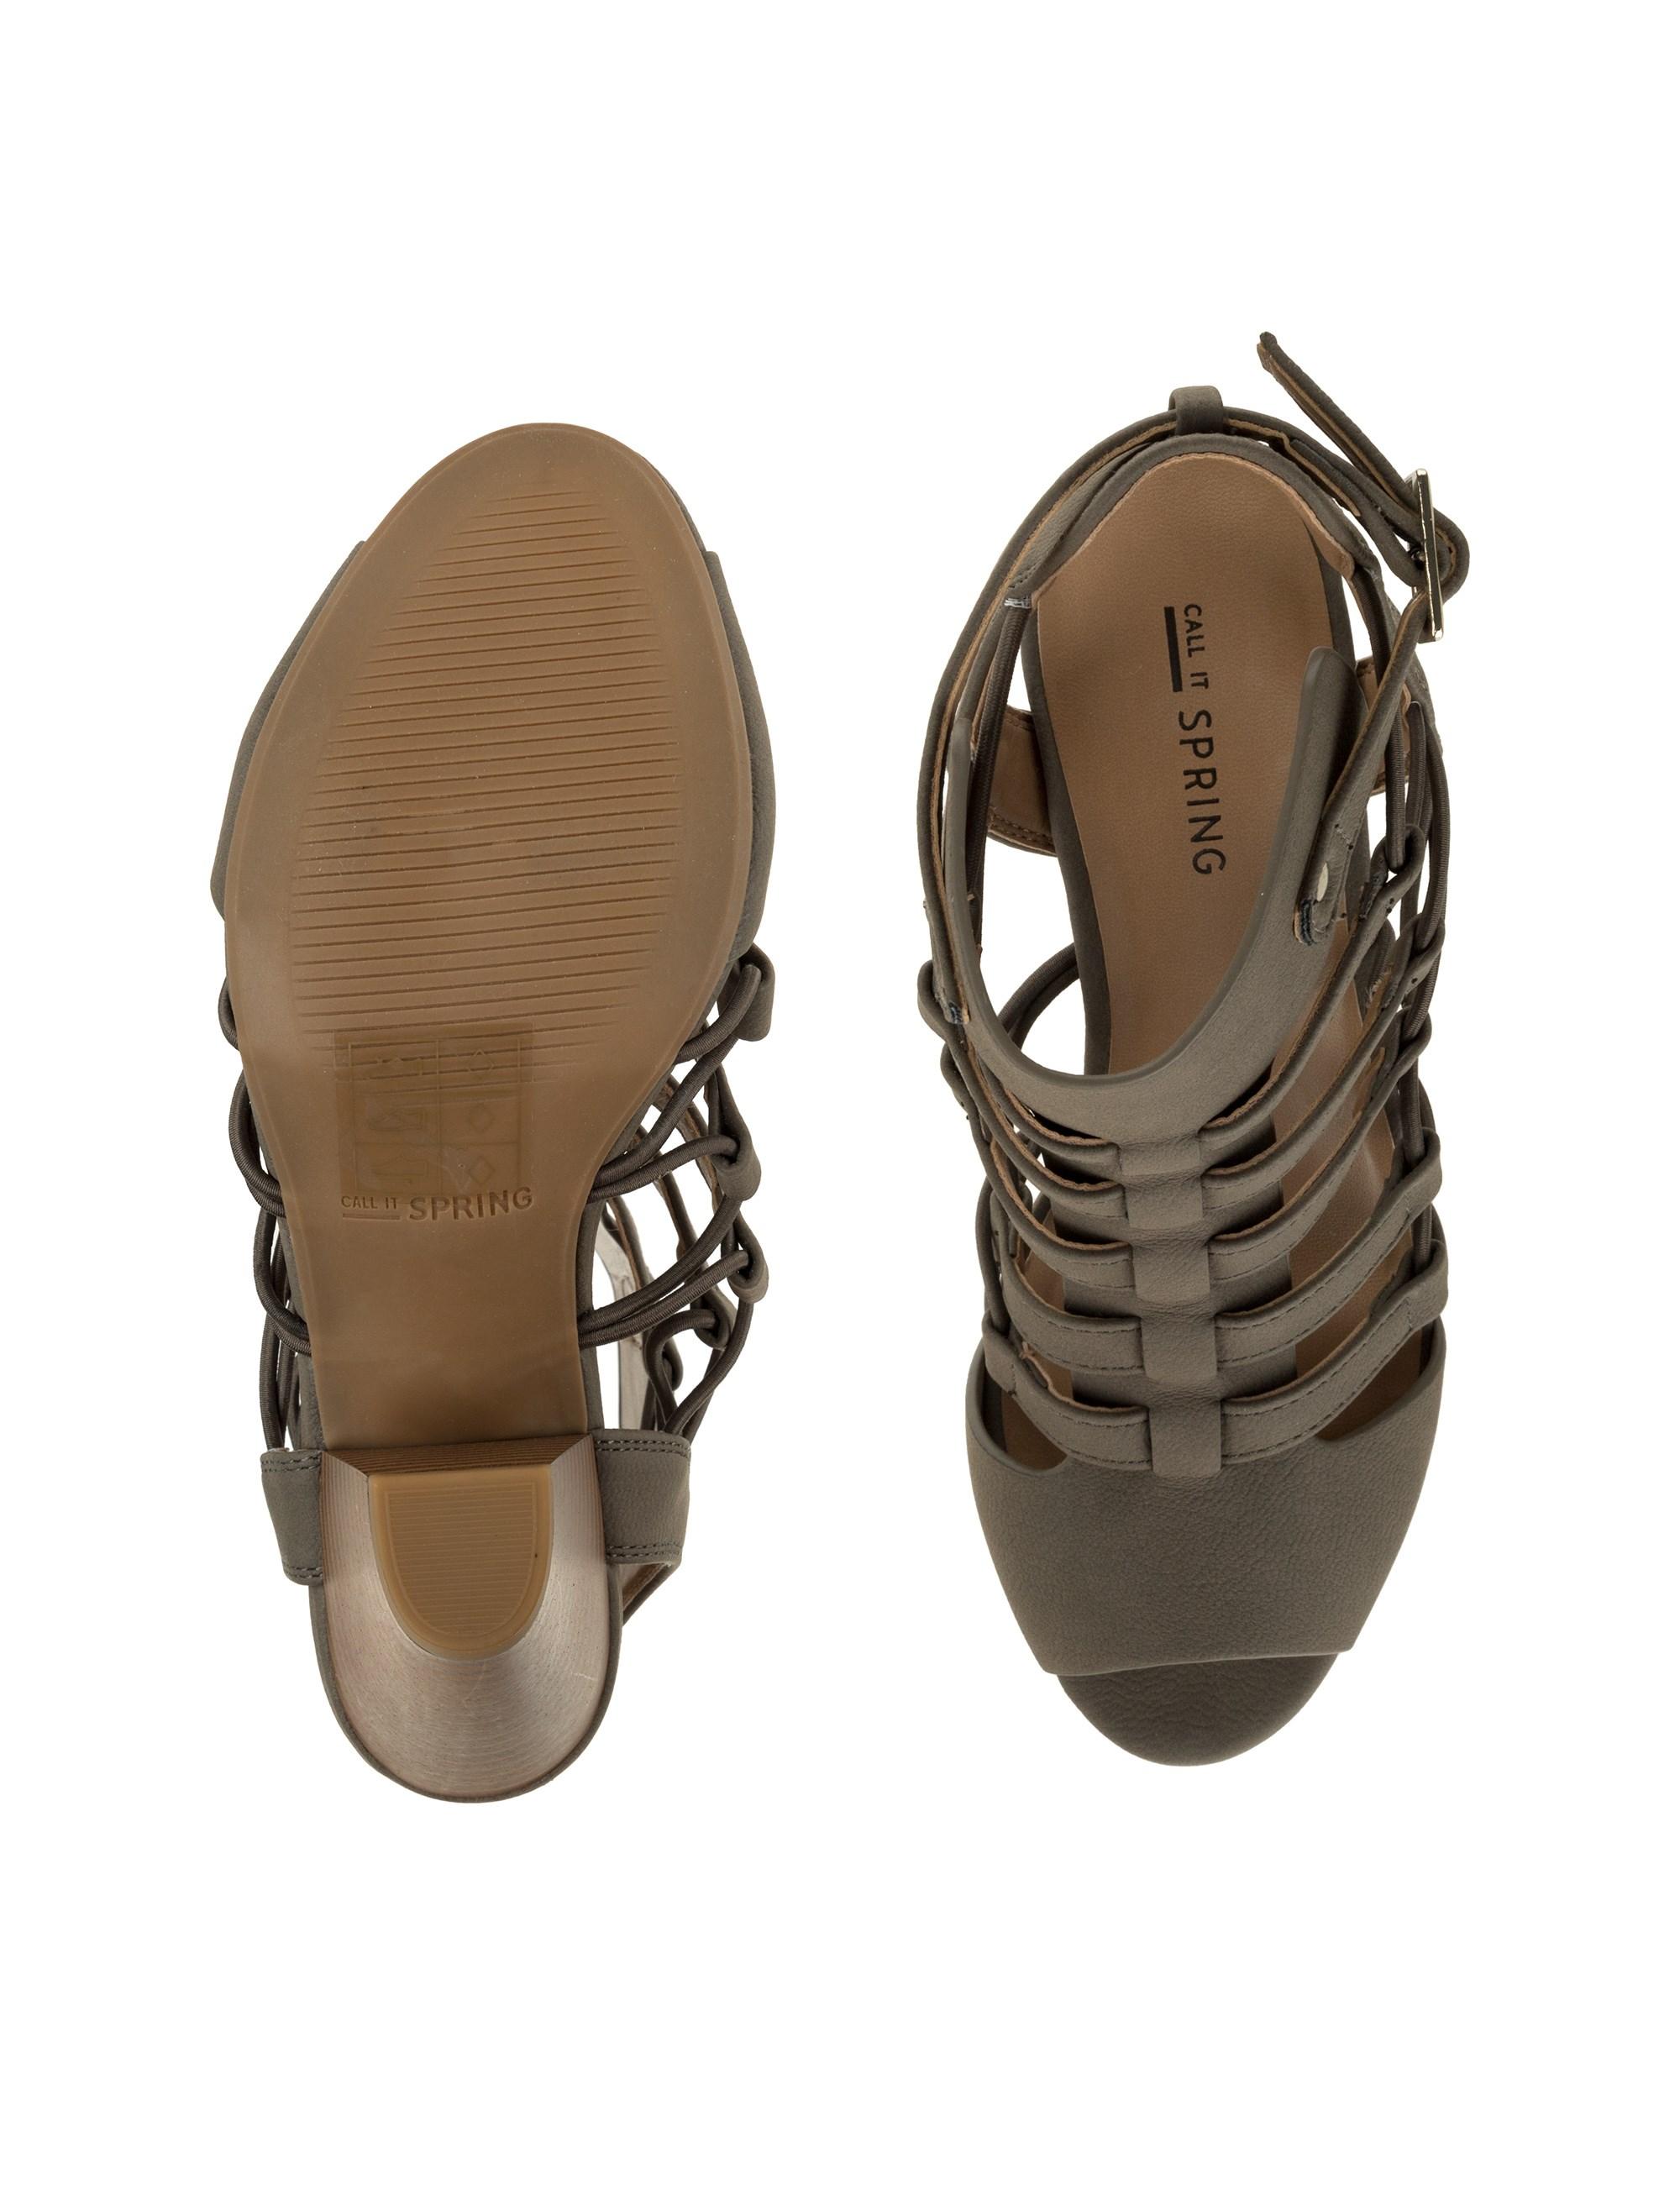 کفش پاشنه بلند زنانه - کال ایت اسپرینگ